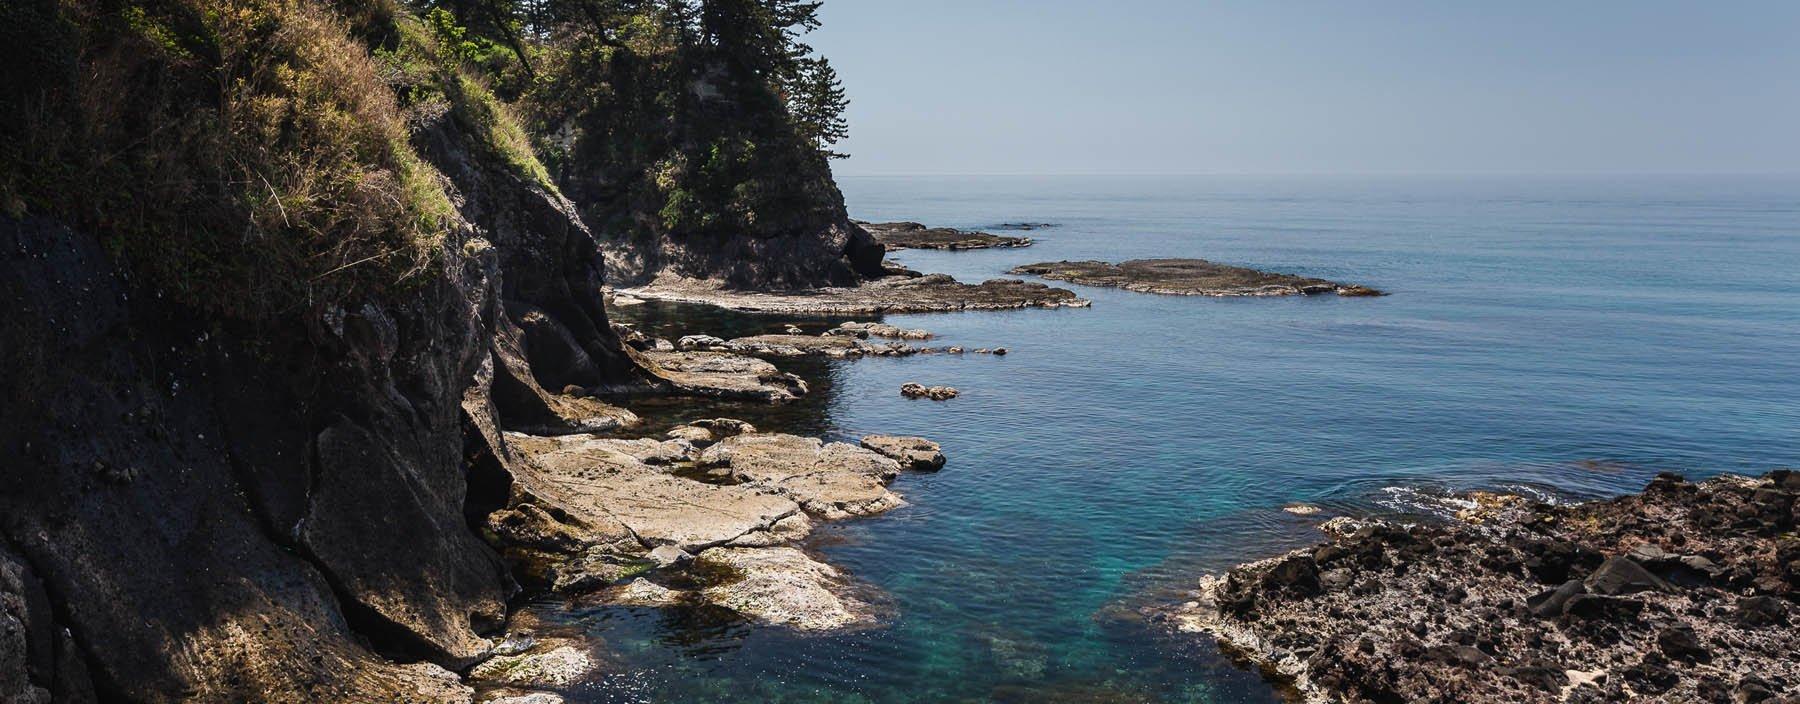 jp, wajima, noto hanto peninsula kustlijn